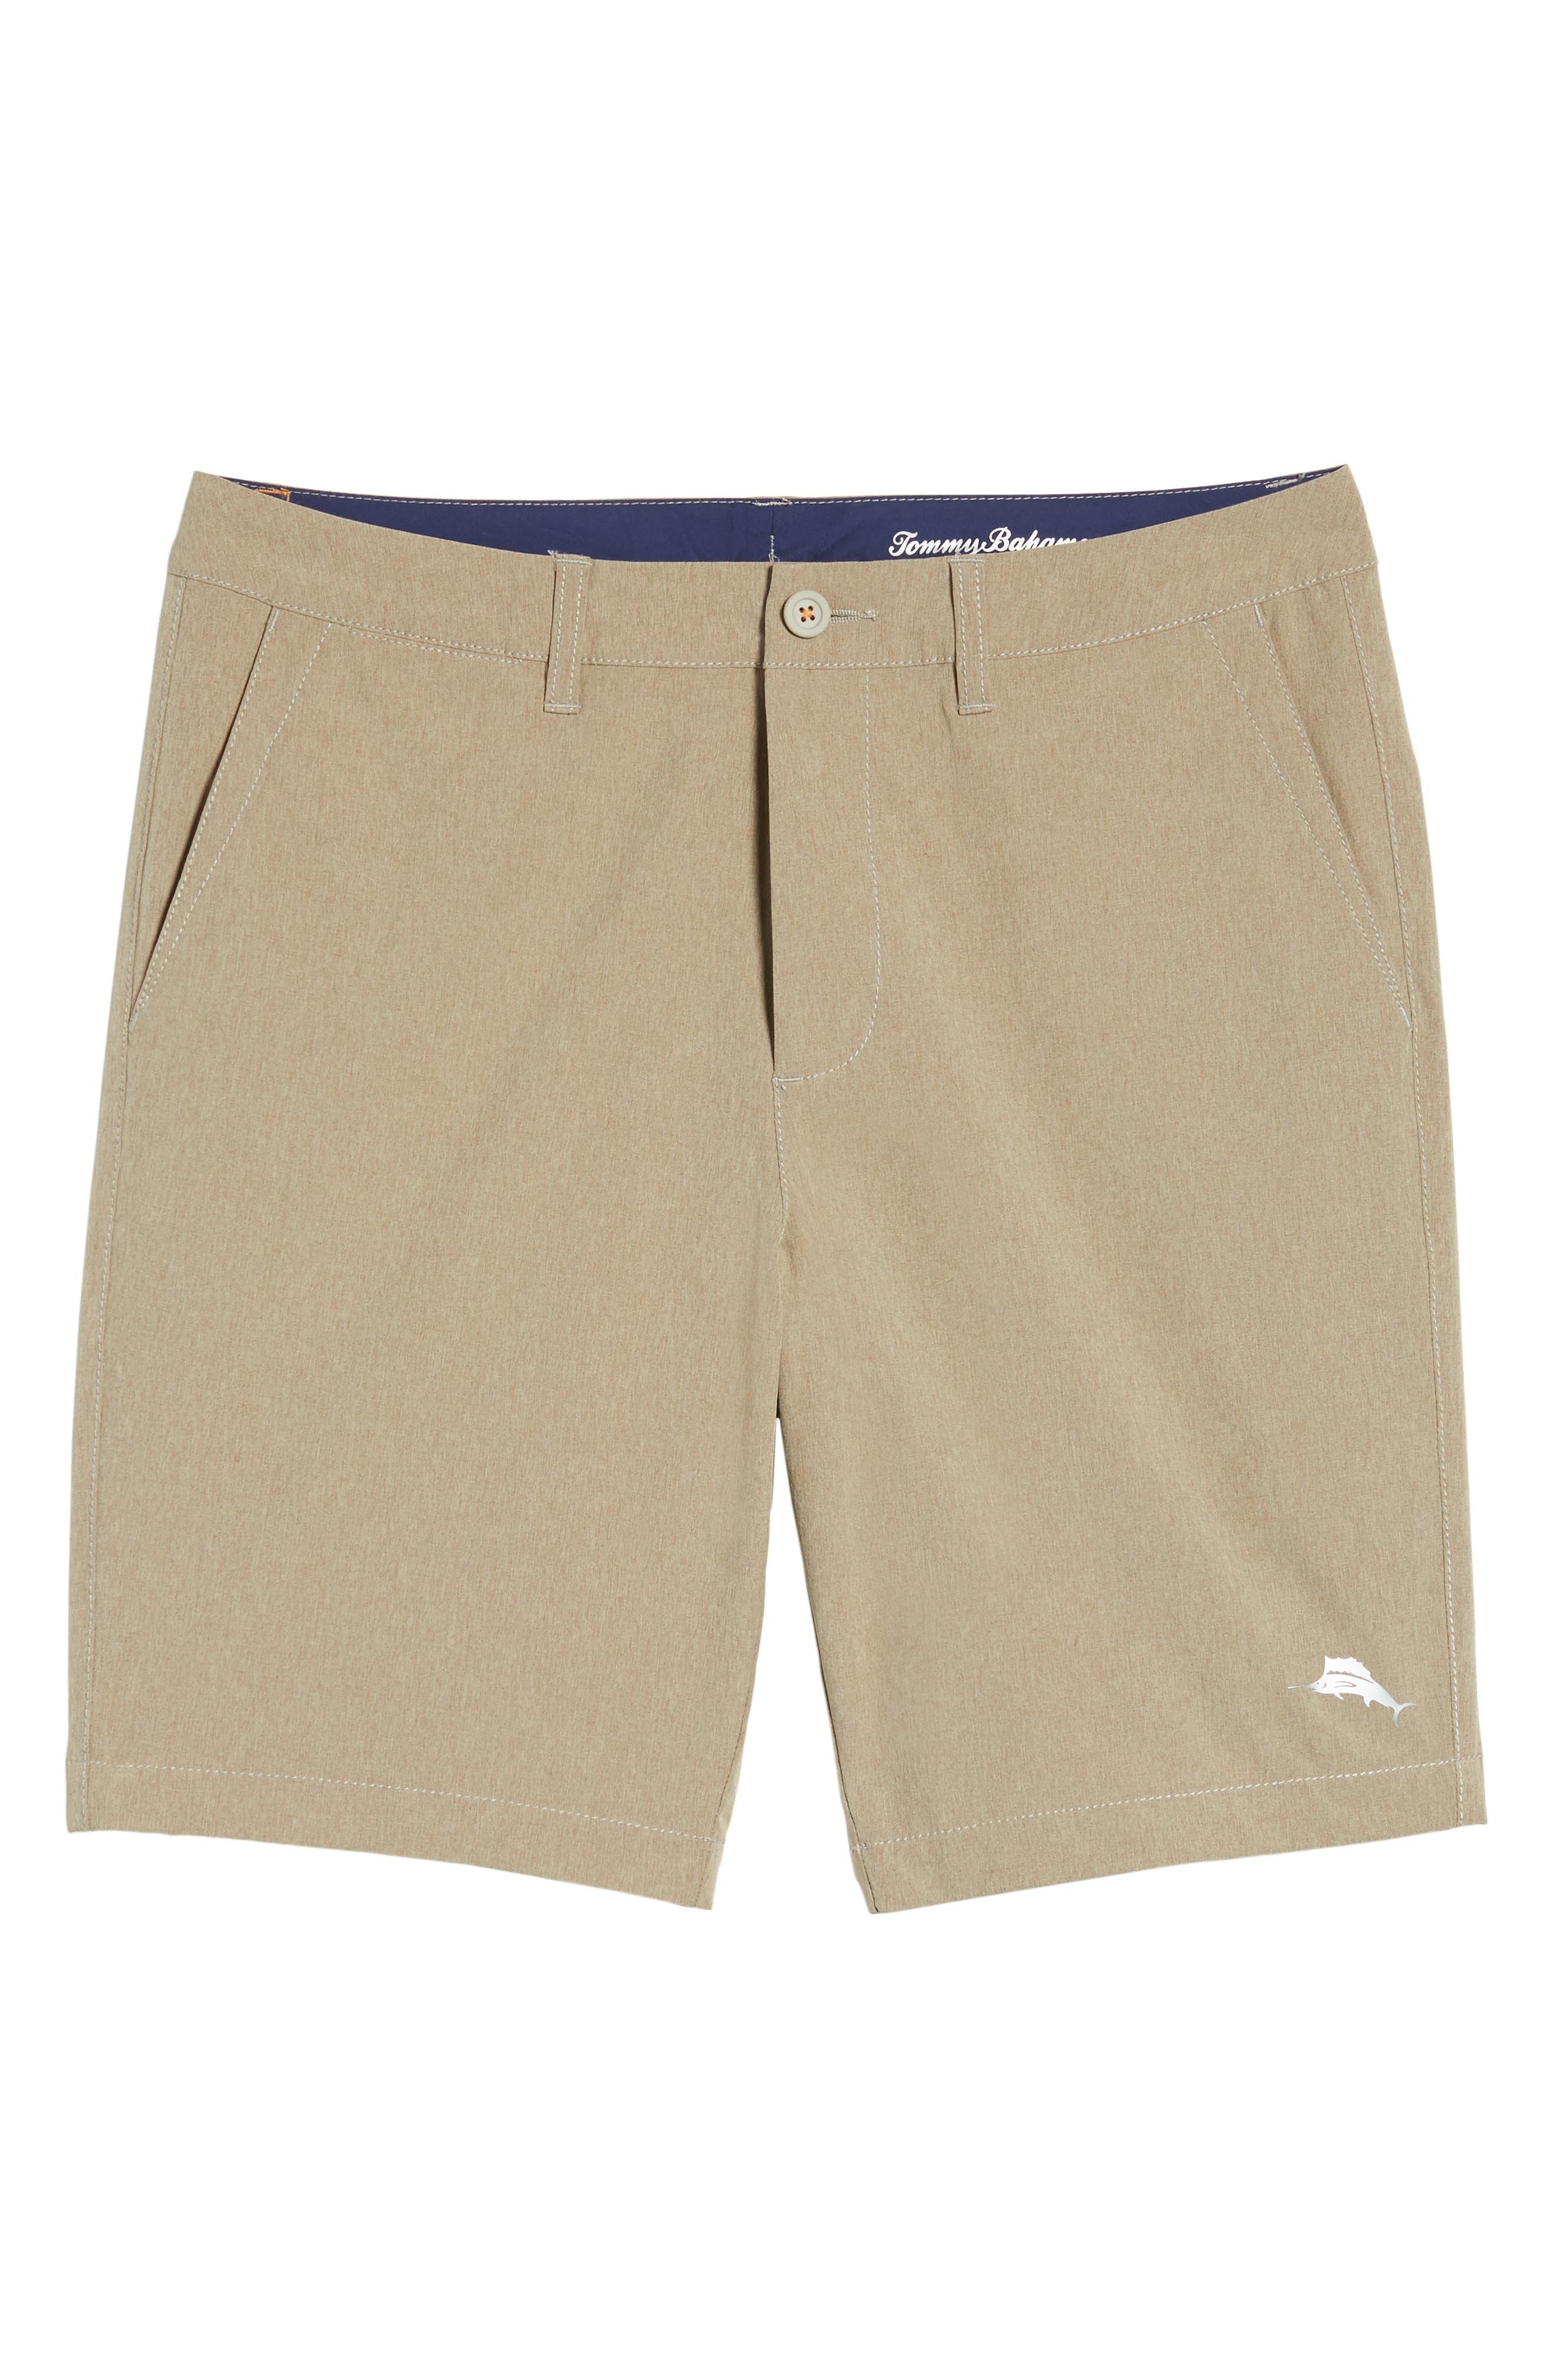 'Cayman Isles' Hybrid Swim Shorts,                             Alternate thumbnail 6, color,                             Dark Twill